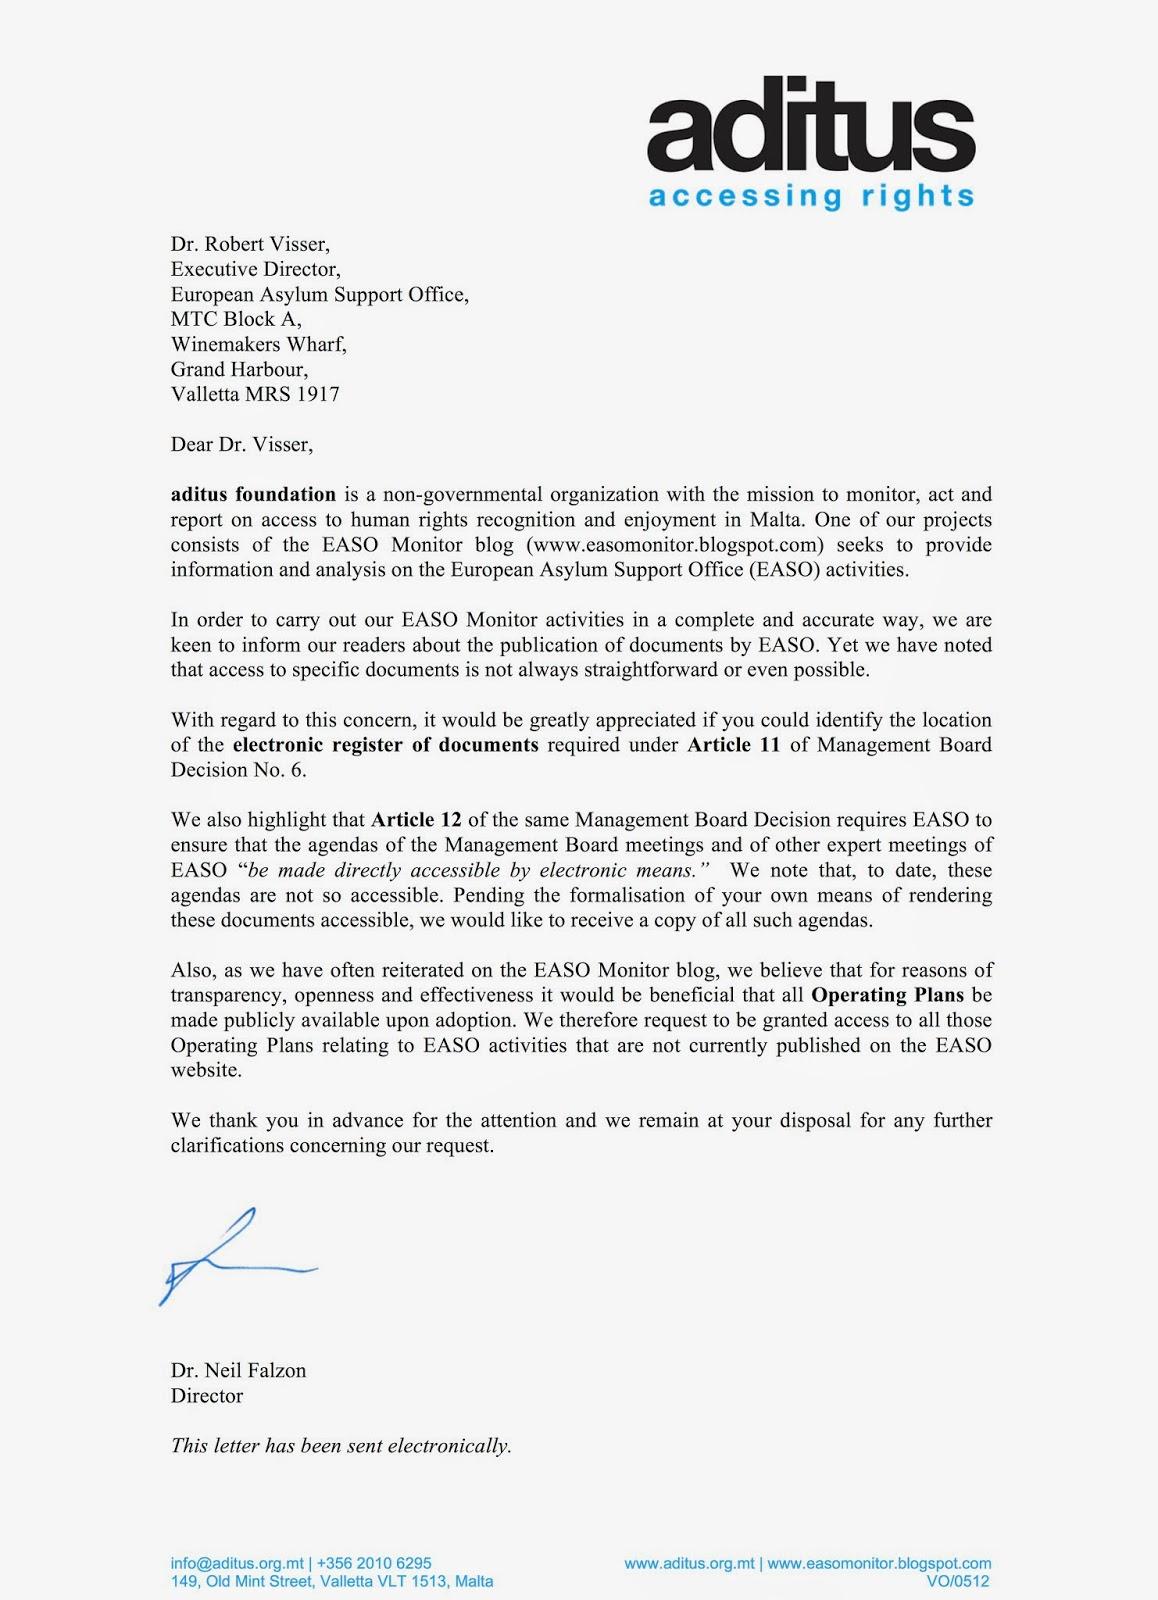 Professional Apology Letter   Markushenri.tk